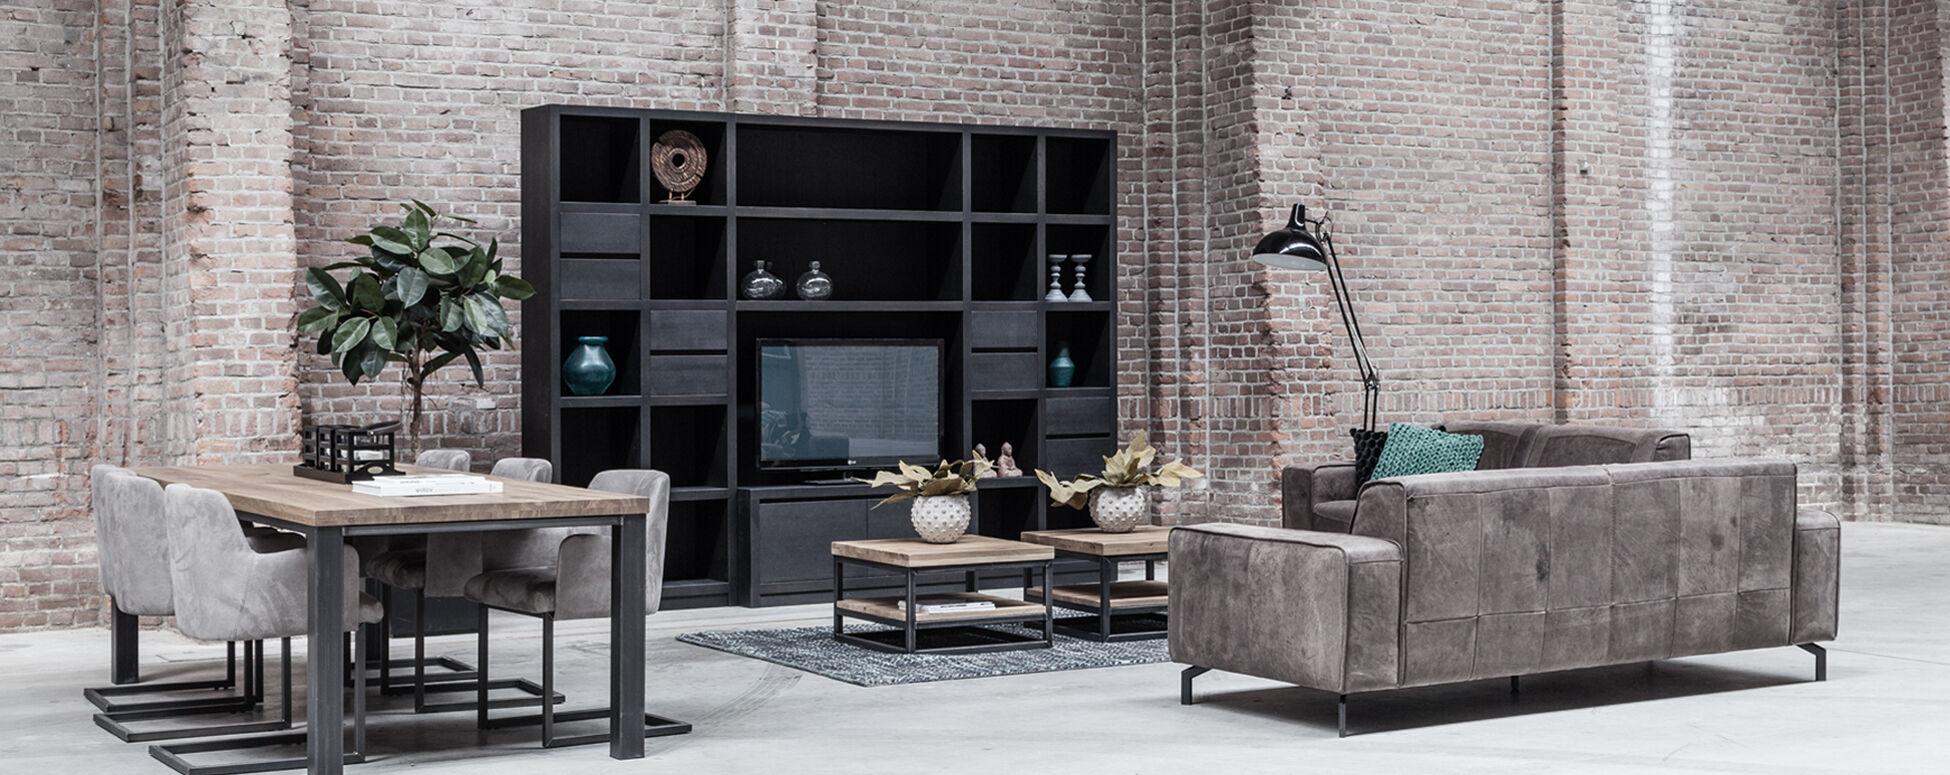 Heerkens Interieurs: Meubels in Heeswijk-Dinther, Den Bosch & Heesch